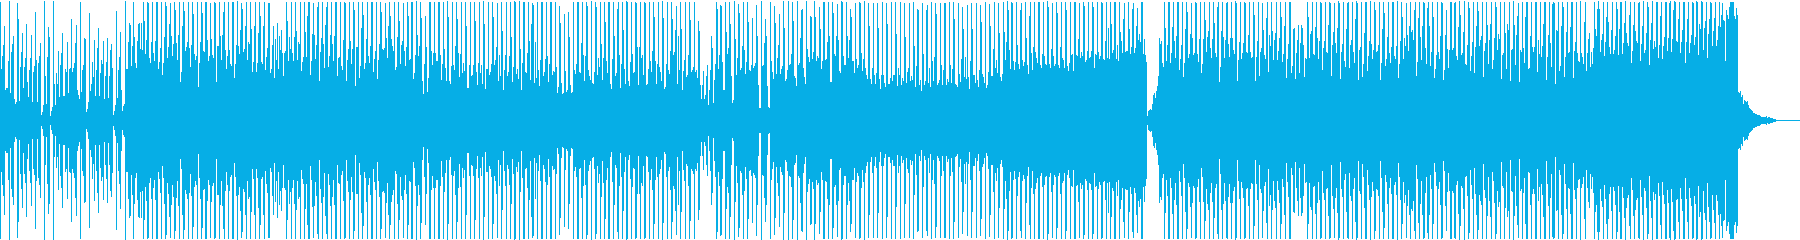 EDM バラエティ 情熱 パッションの再生済みの波形